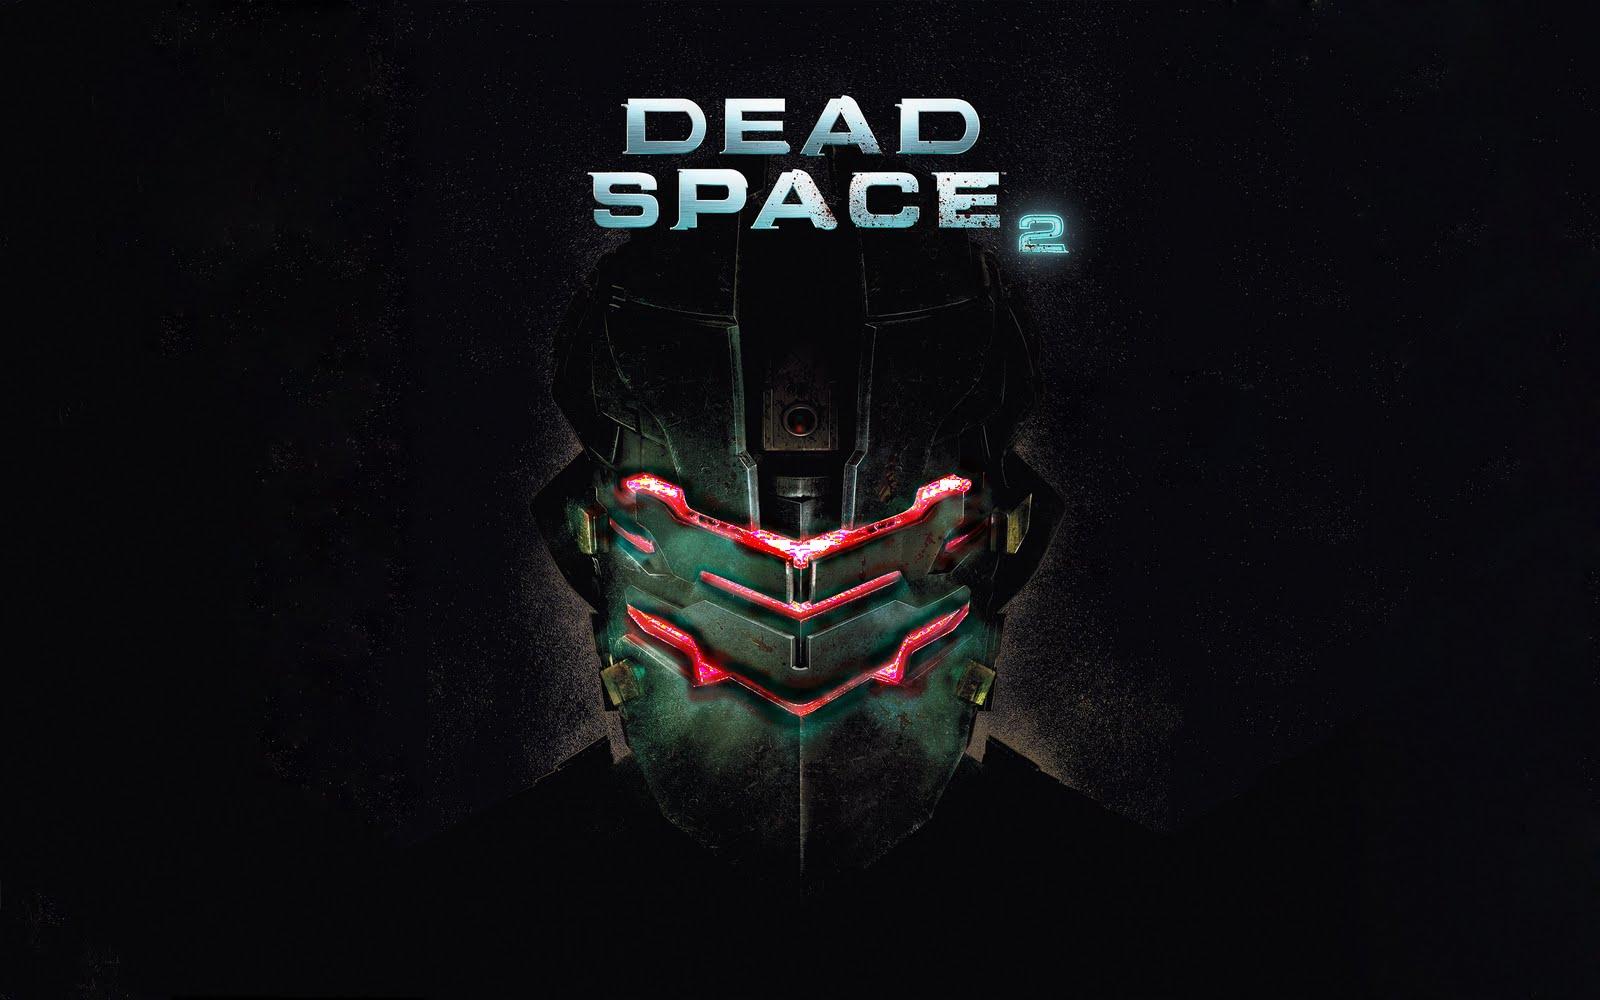 Dead space ii hd wallpapers download hd video game wallpapers - Dead space 1 wallpaper hd ...